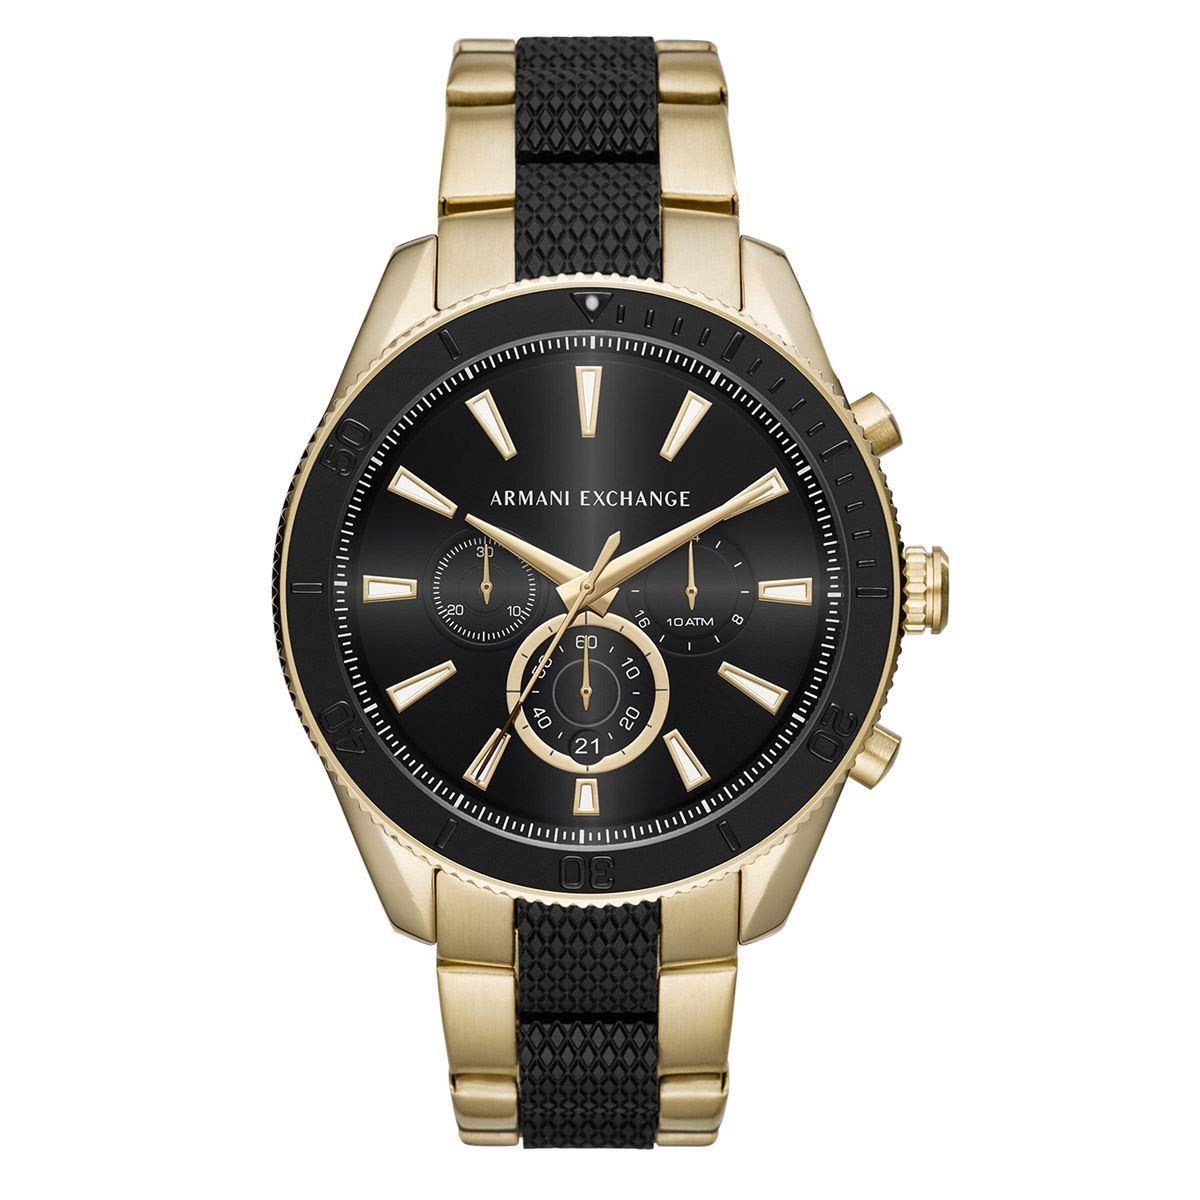 Reloj Armani Exchange AX1814 Caballero